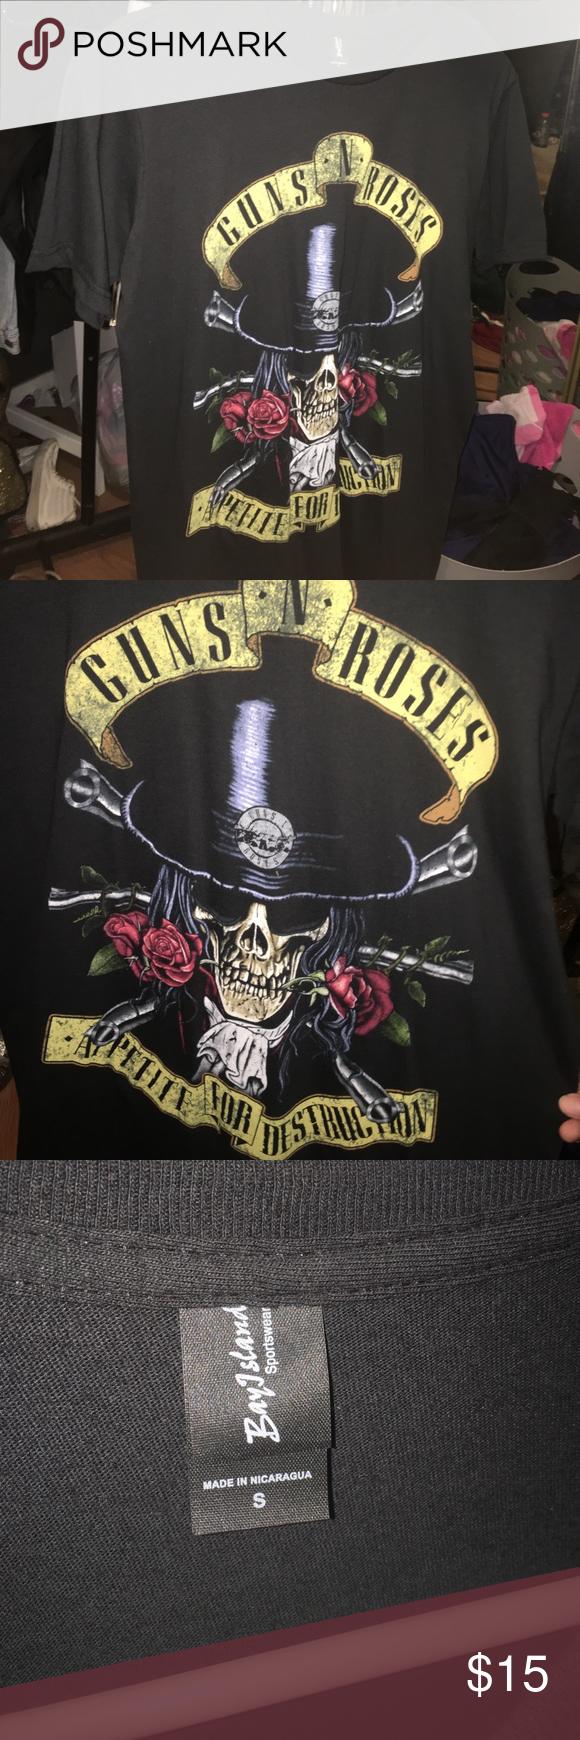 d379730c9268 Guns N Roses T Shirt Womens Target